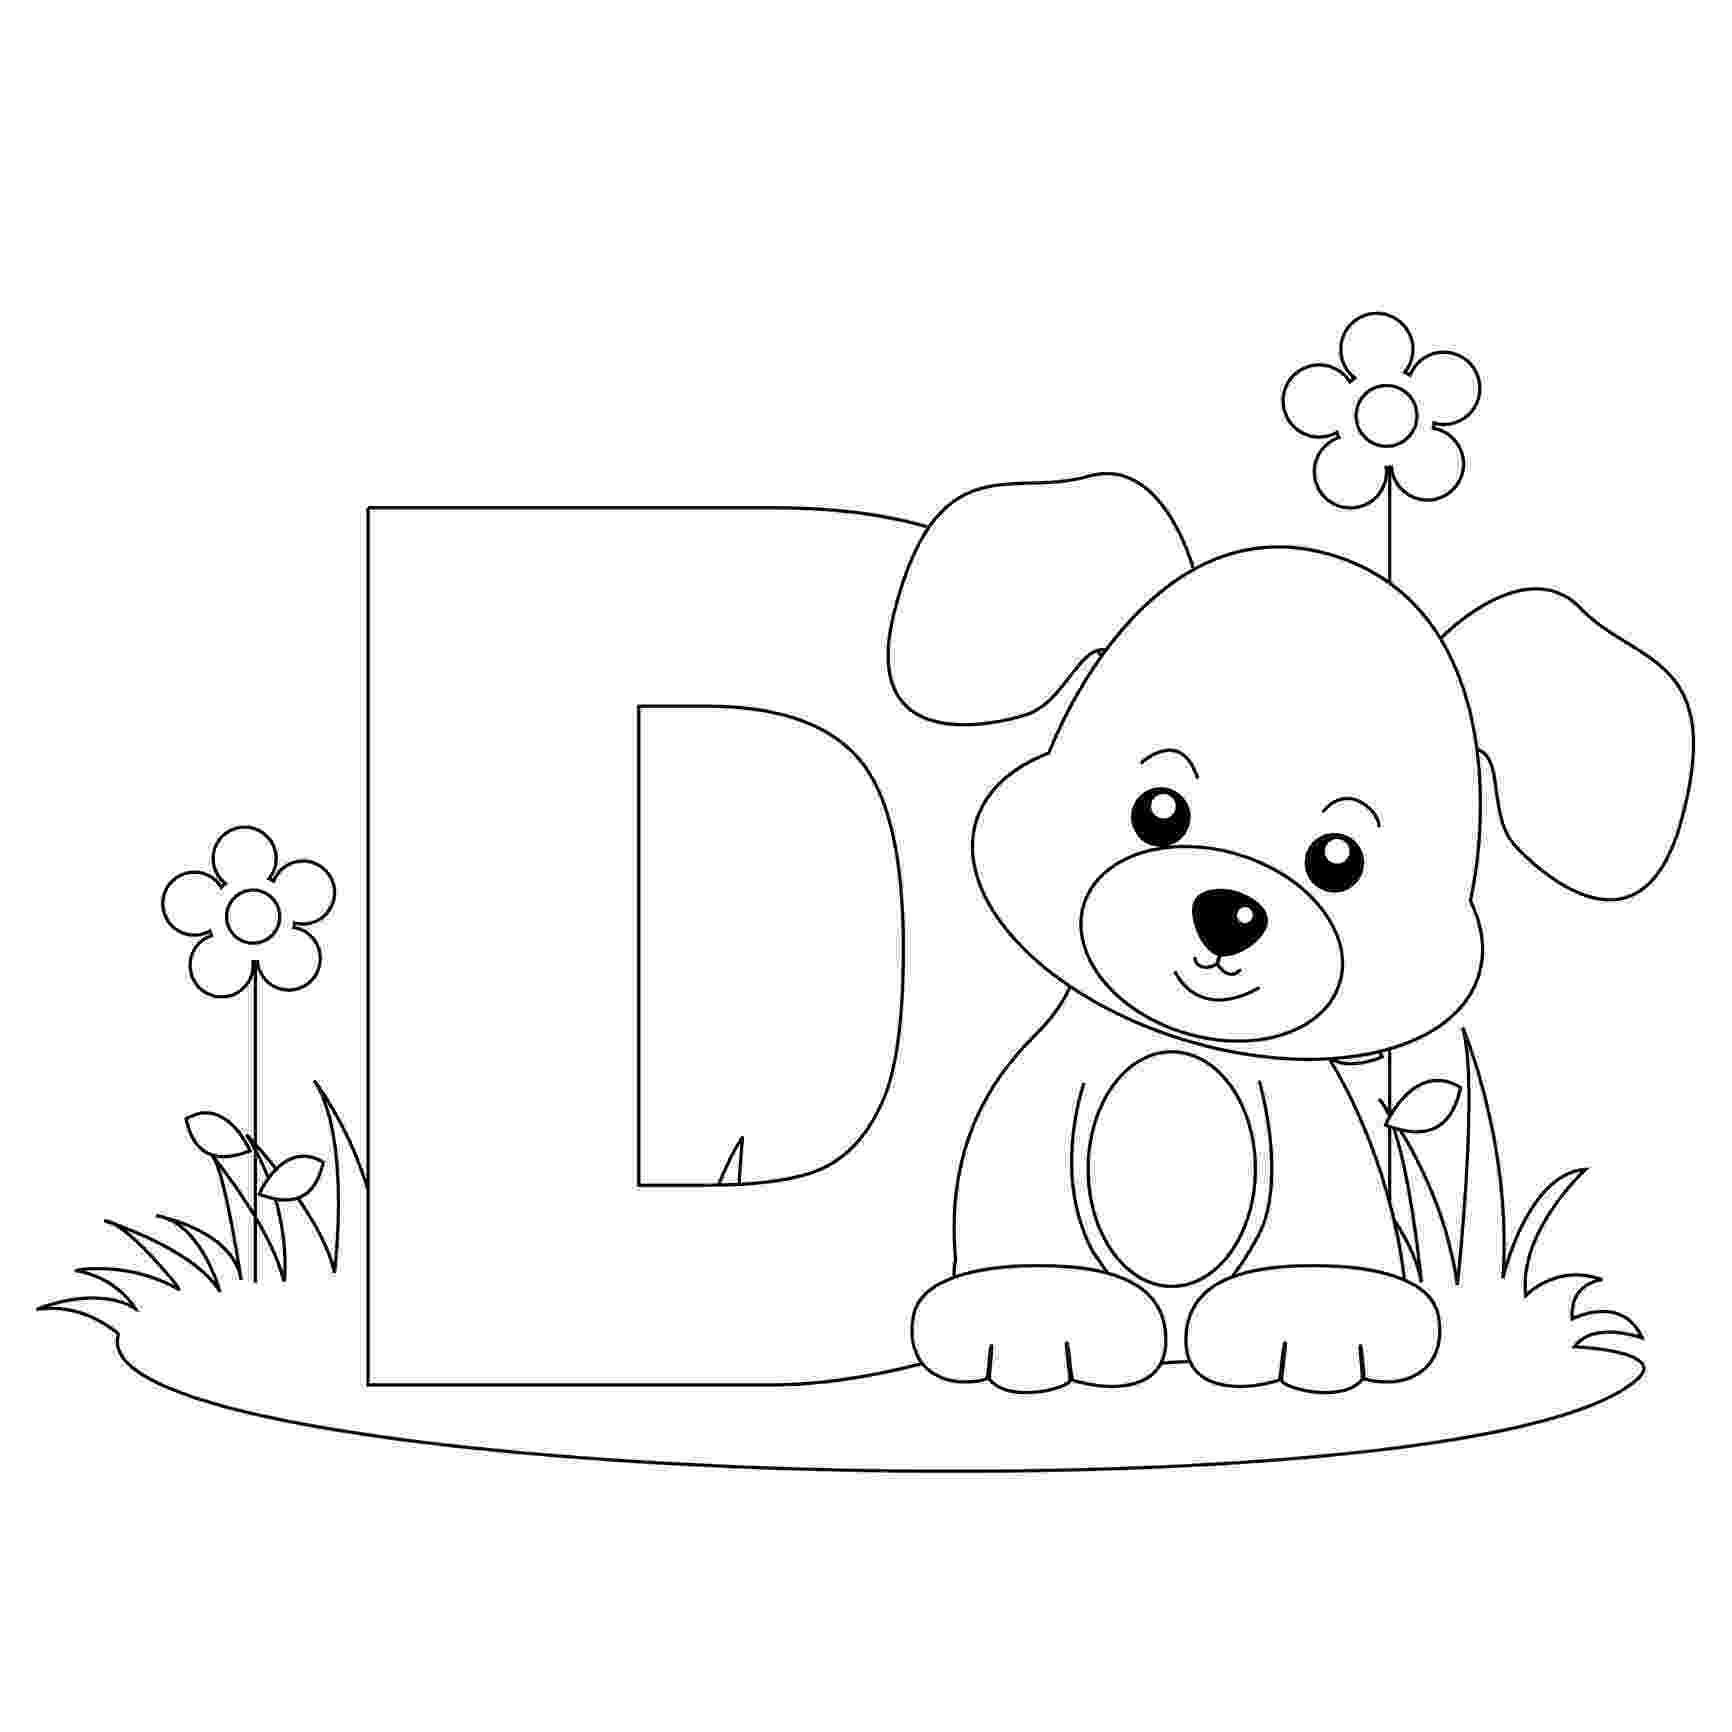 alphabet coloring worksheets free printable alphabet coloring pages for kids best worksheets coloring alphabet 1 2